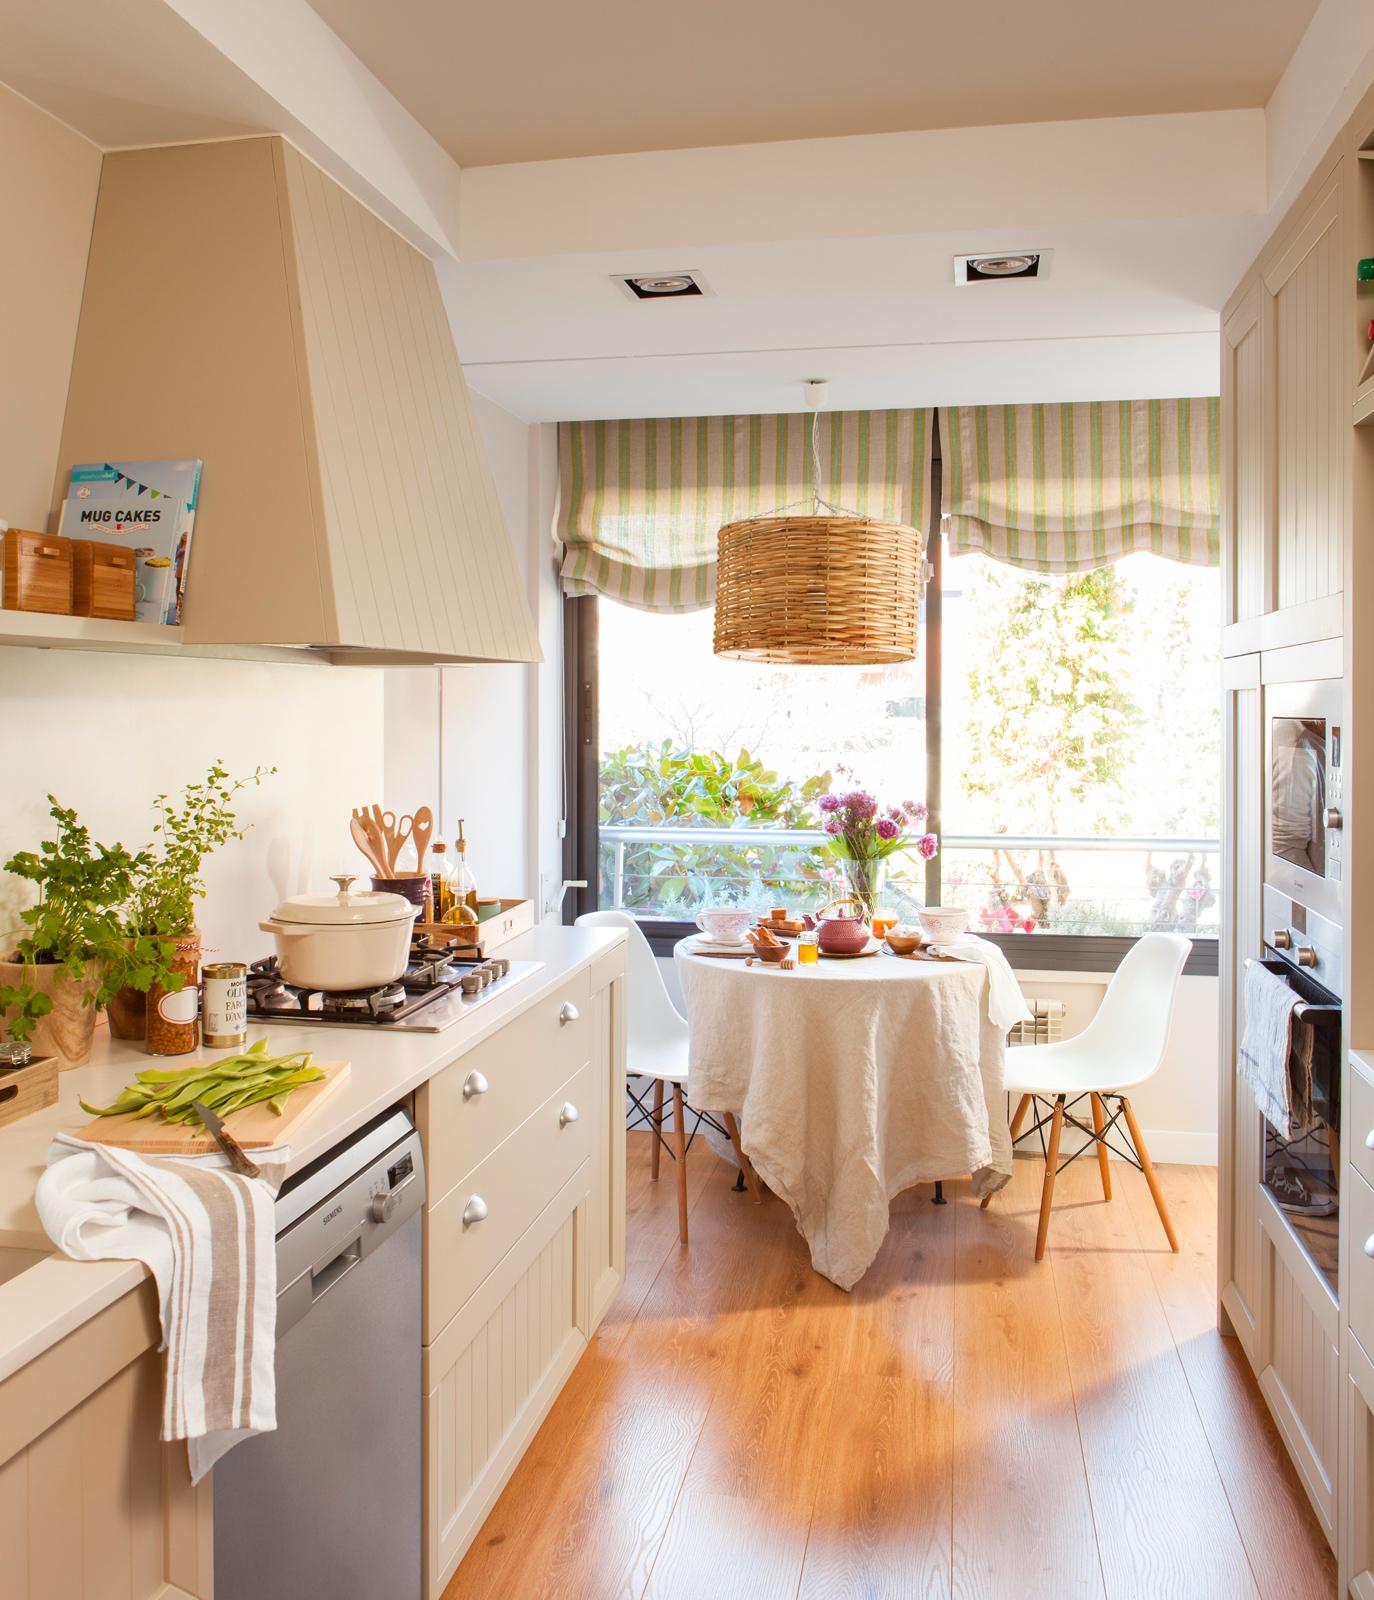 Muebles cocina pequena 20170828232845 for Muebles de cocina pequena